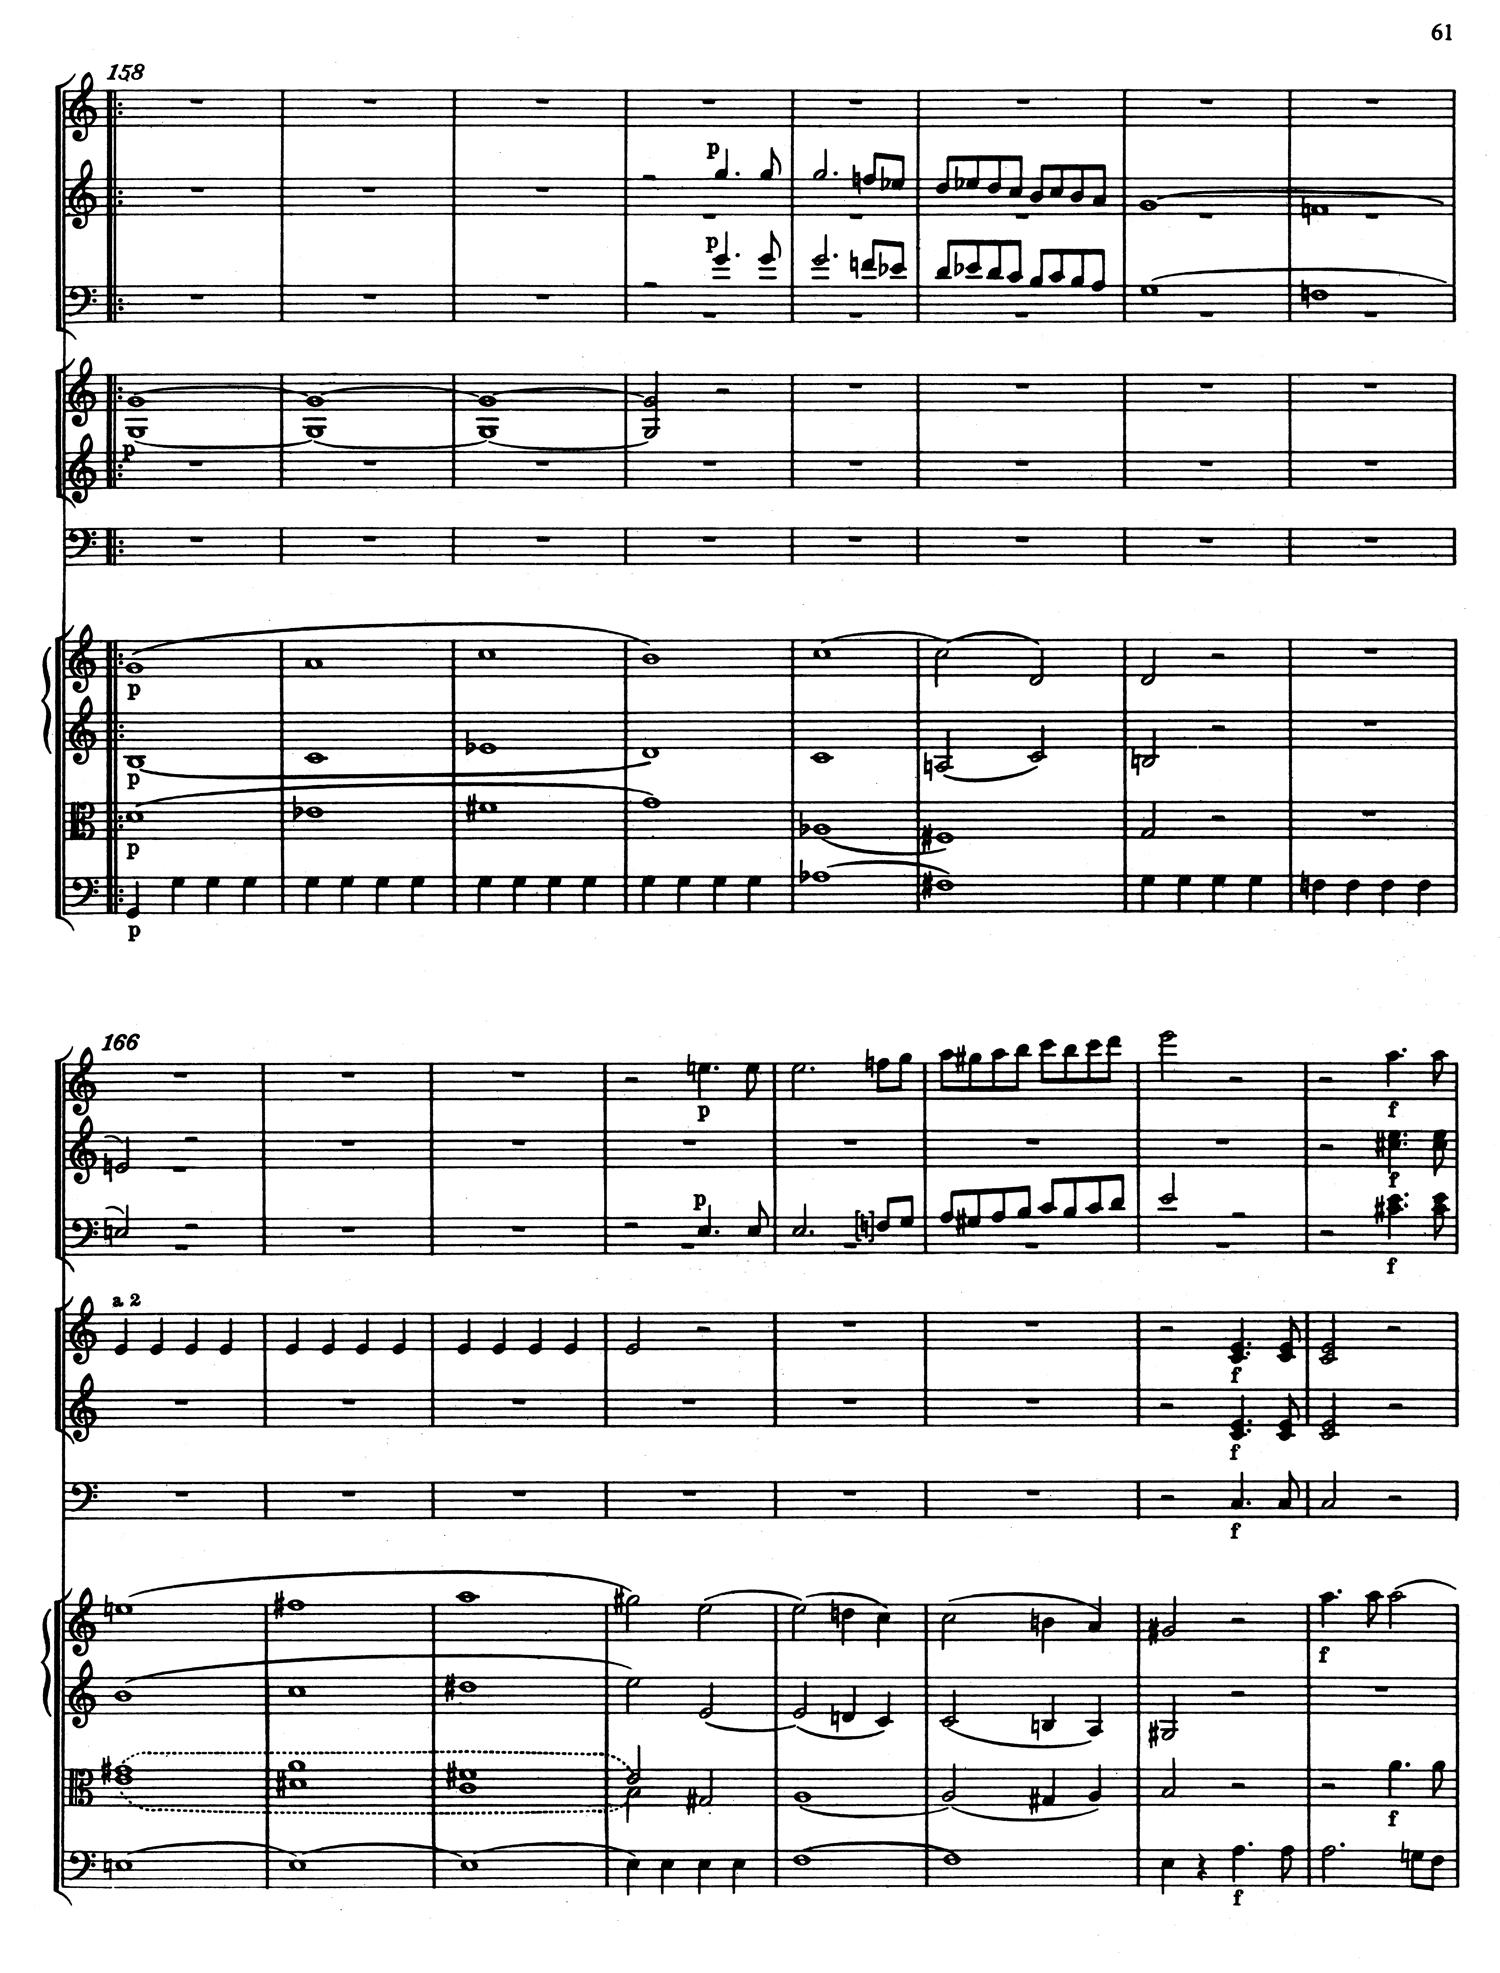 Mozart Jupiter Score 5.jpg